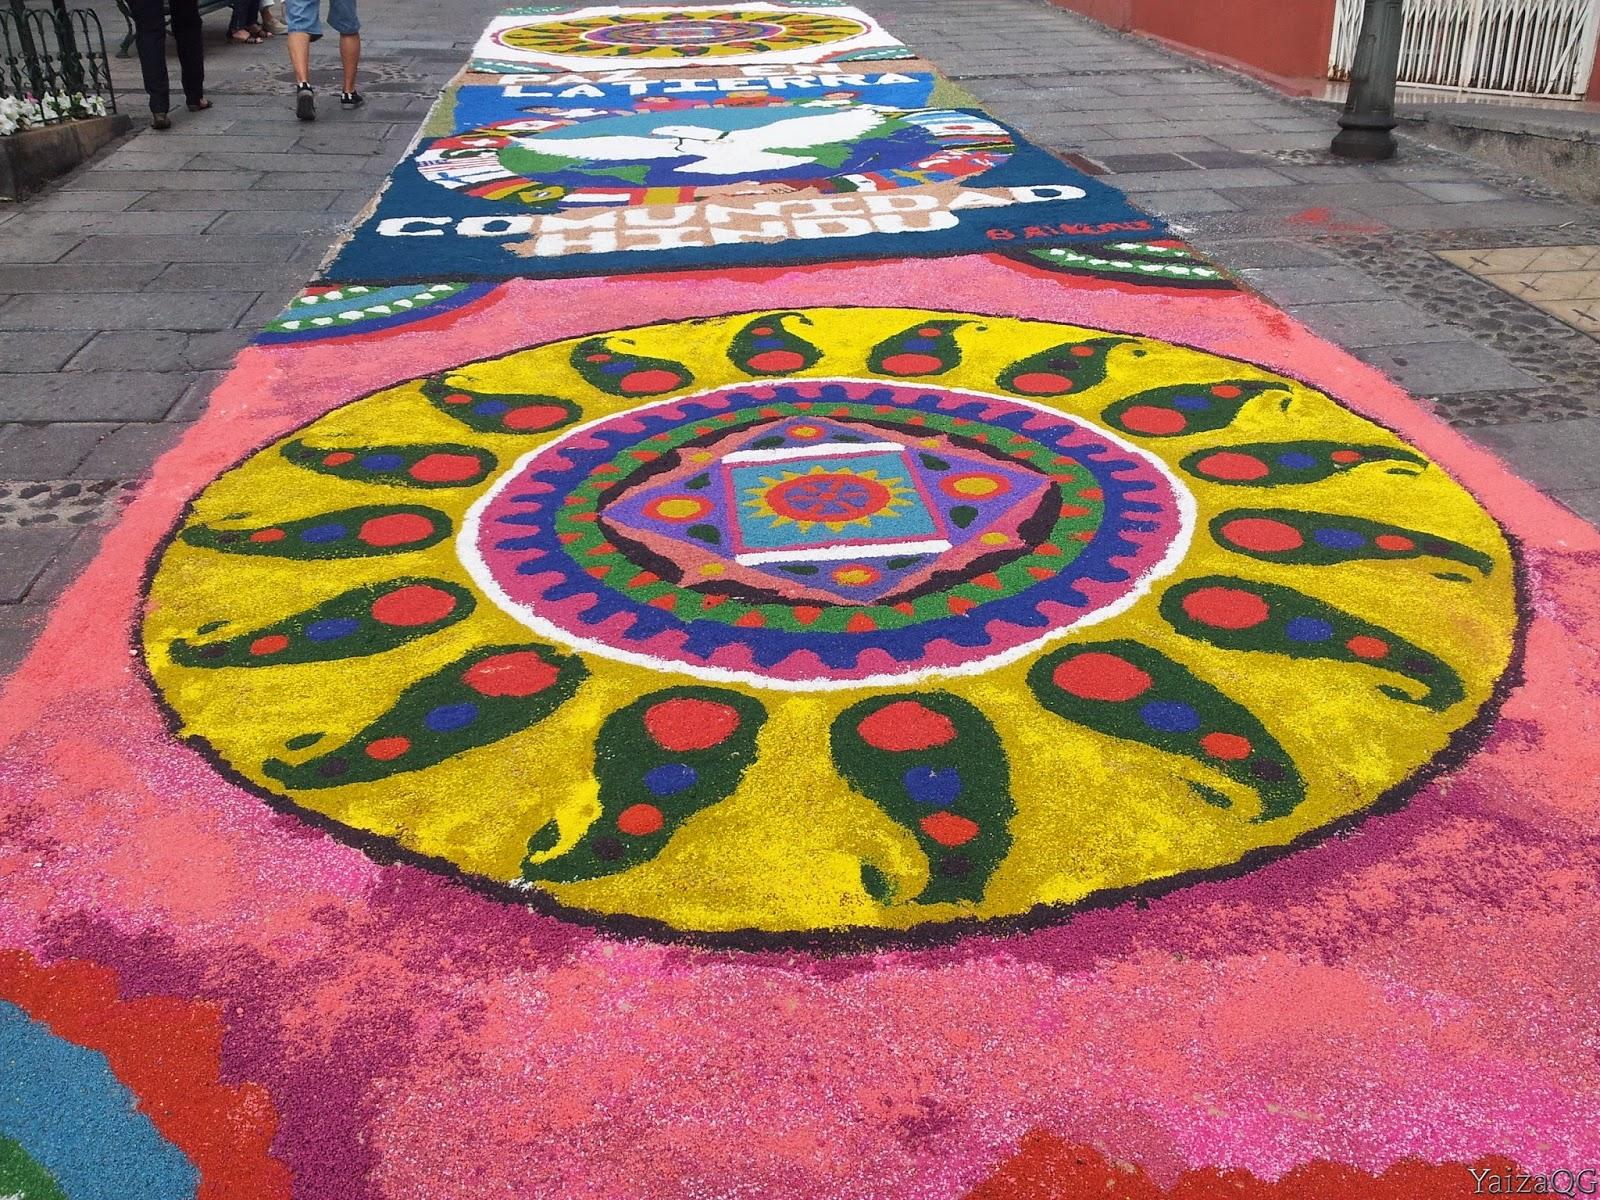 Andandoxtenerife Alfombras Del Corpus Christi The Carpets Of The